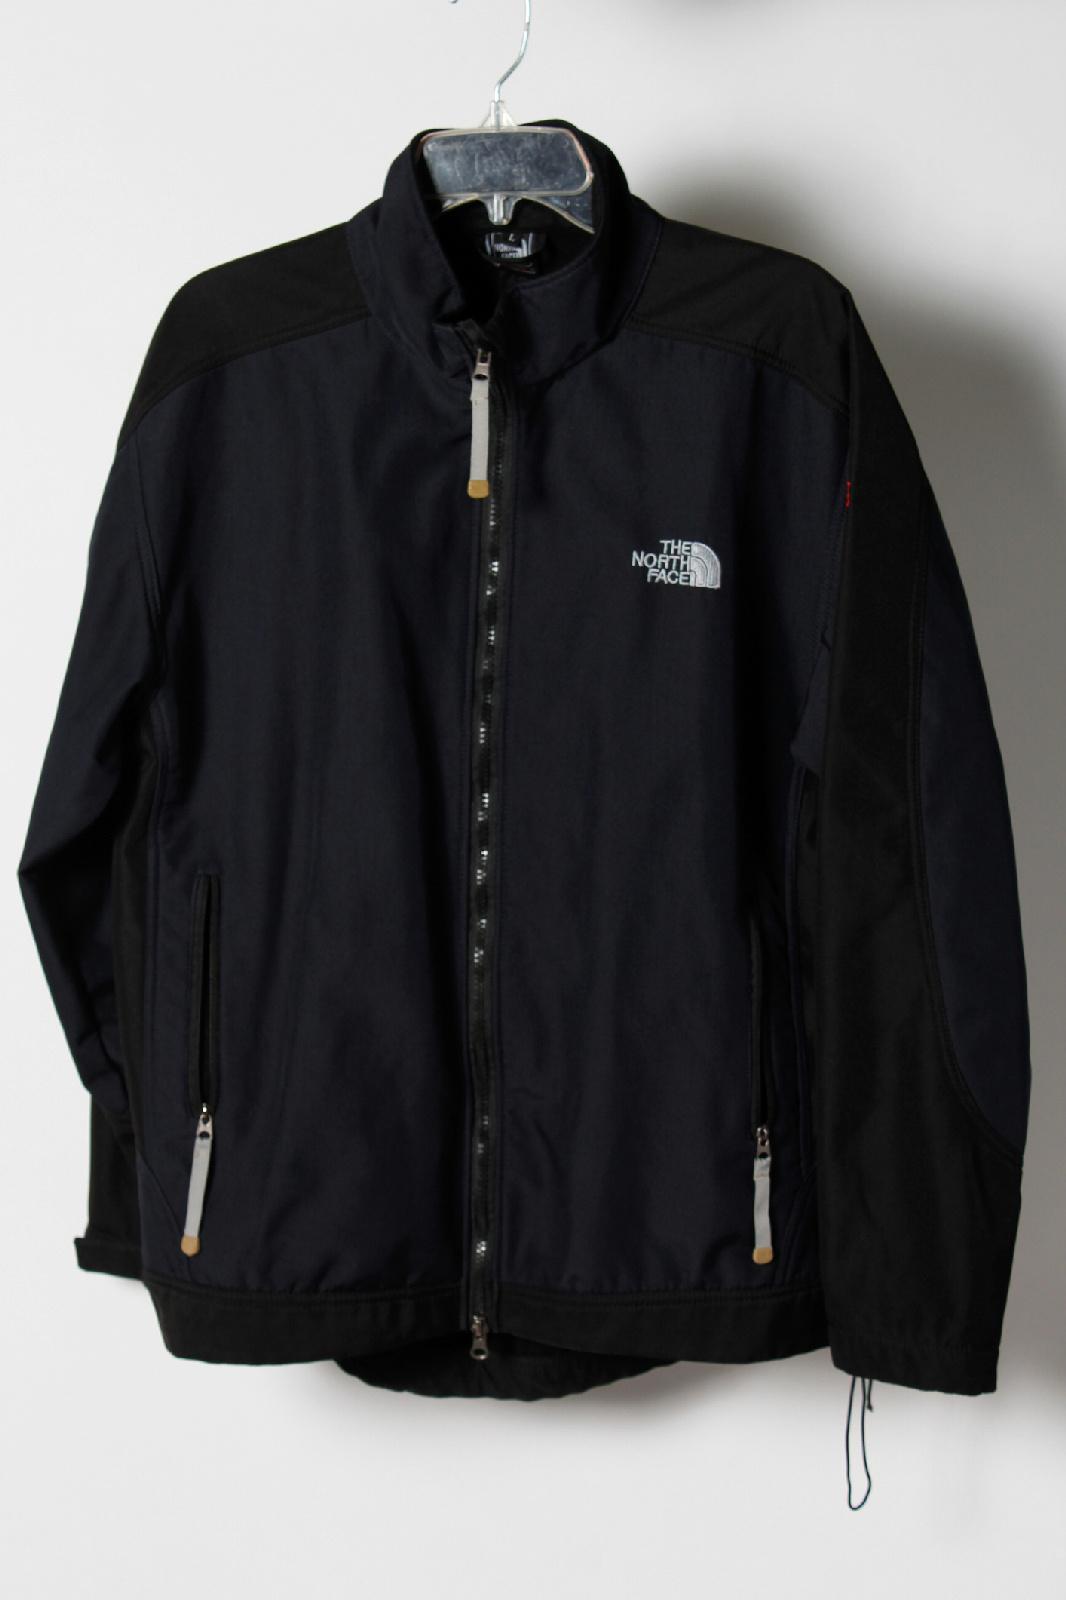 5d22ccf9c6 ... switzerland genuine the north face s m mens summit series windstopper  softshell jacket black. eur 13954 ...